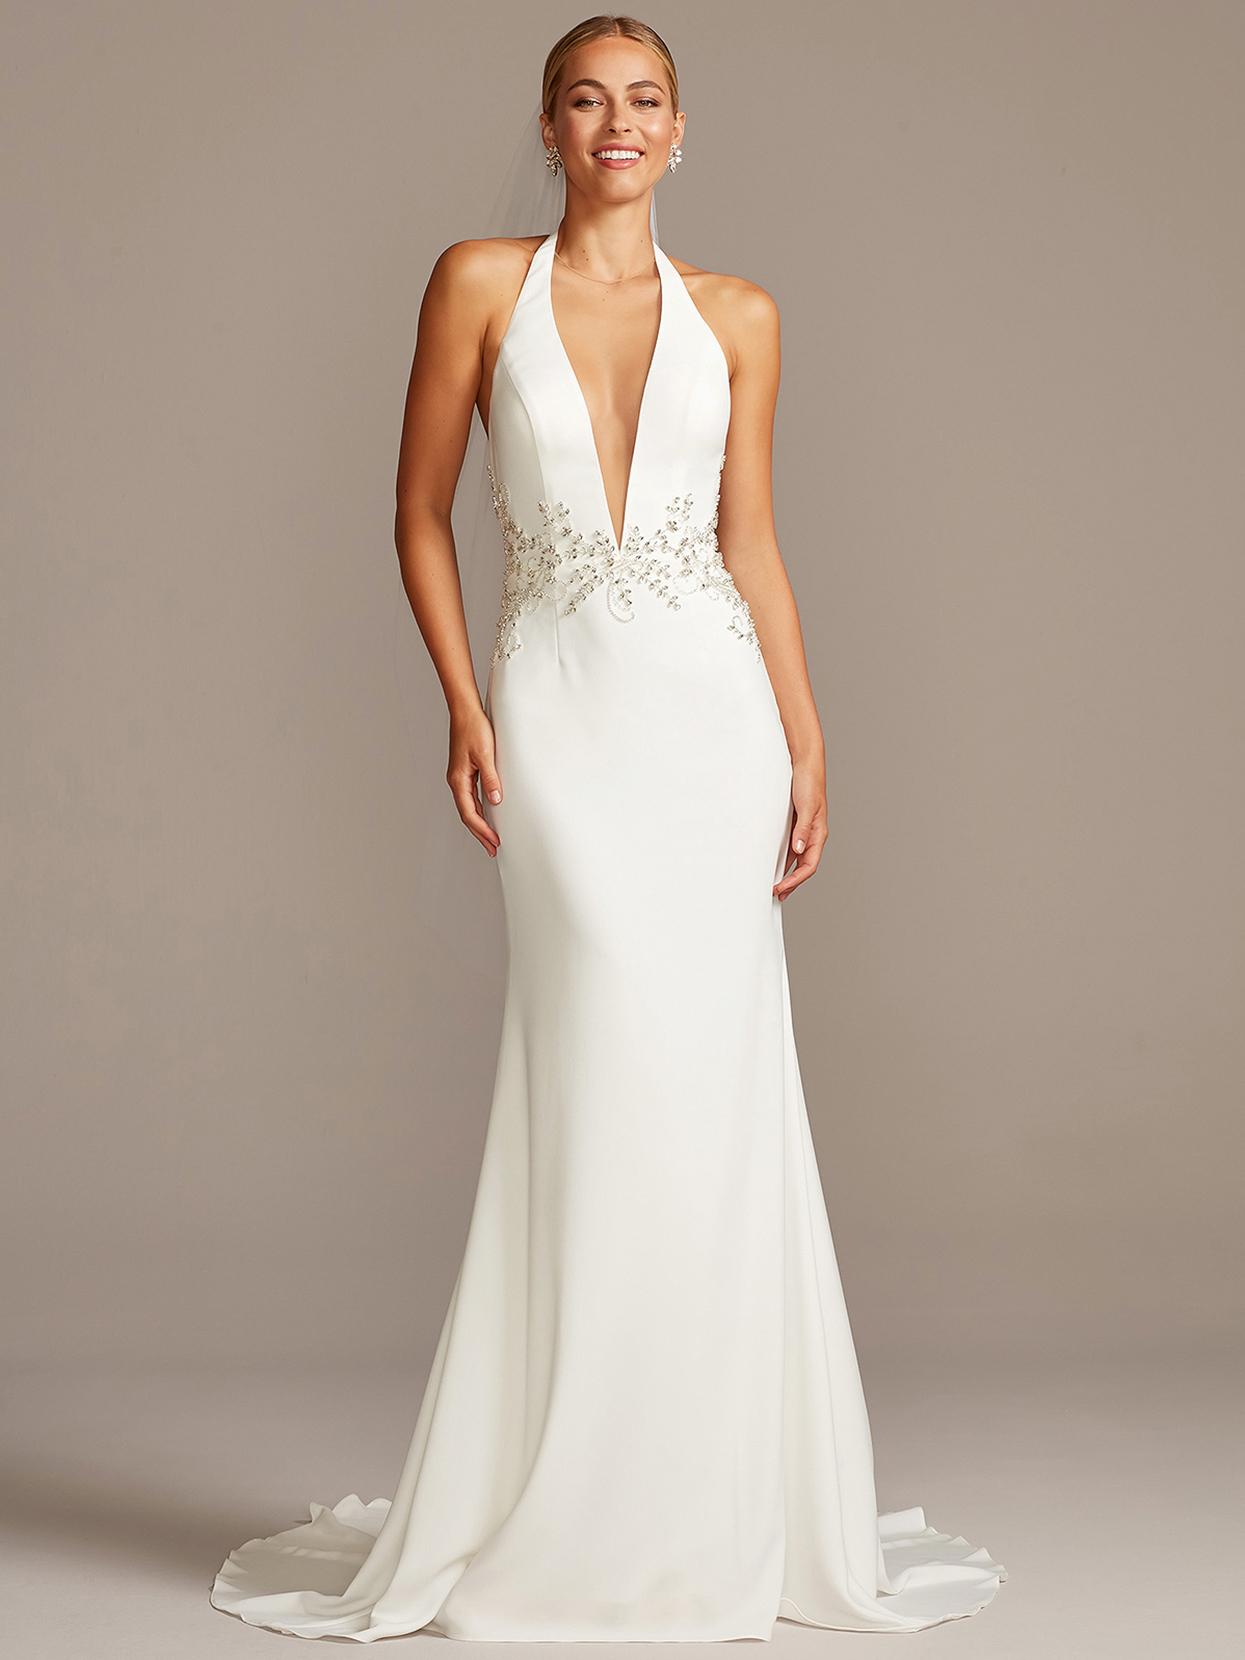 davids bridal galina plunging halter sheath wedding dress fall 2020